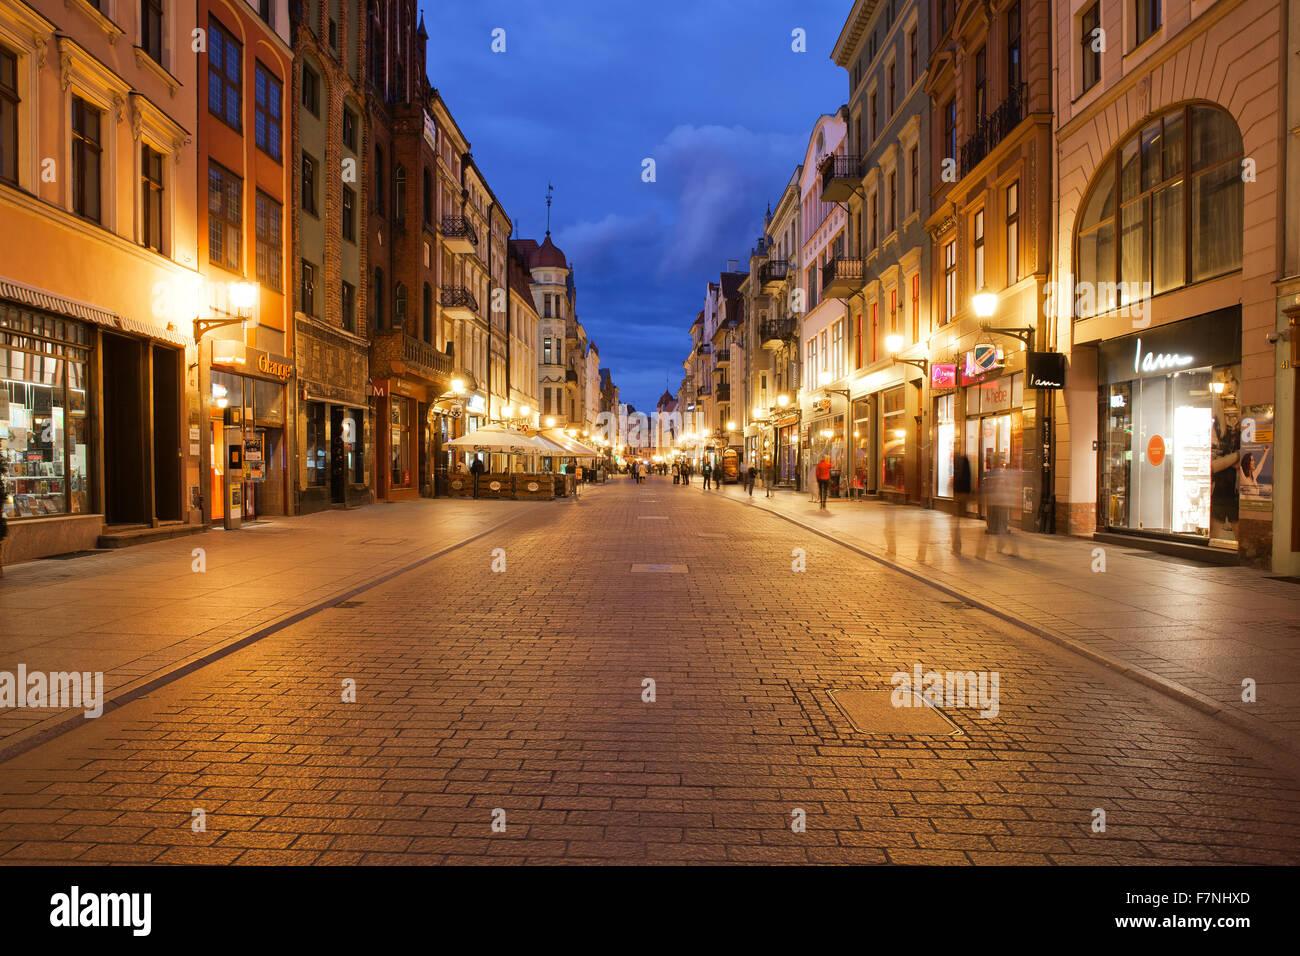 Polen, Torun, Blick auf Szeroka Straße bei Abenddämmerung Stockfoto